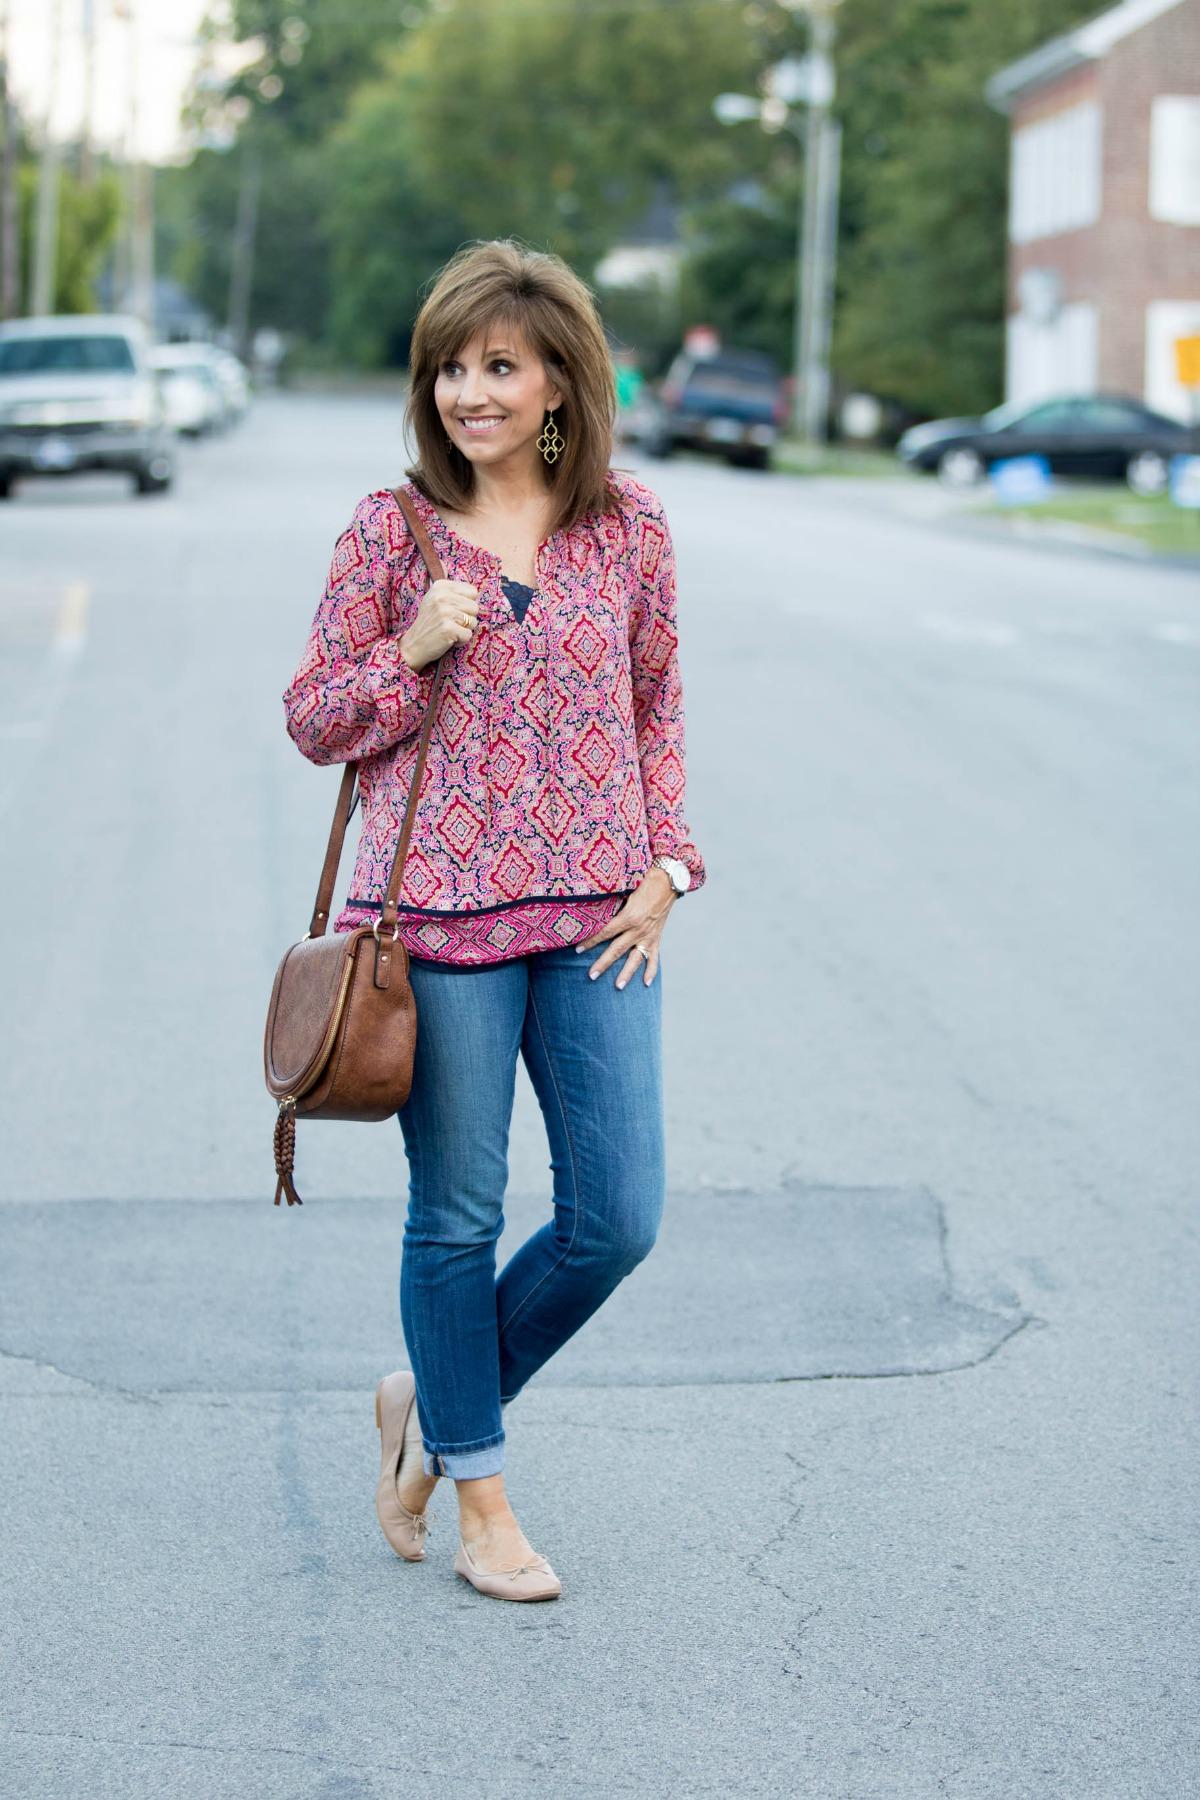 Fall Fashion-Gap Smock Blouse